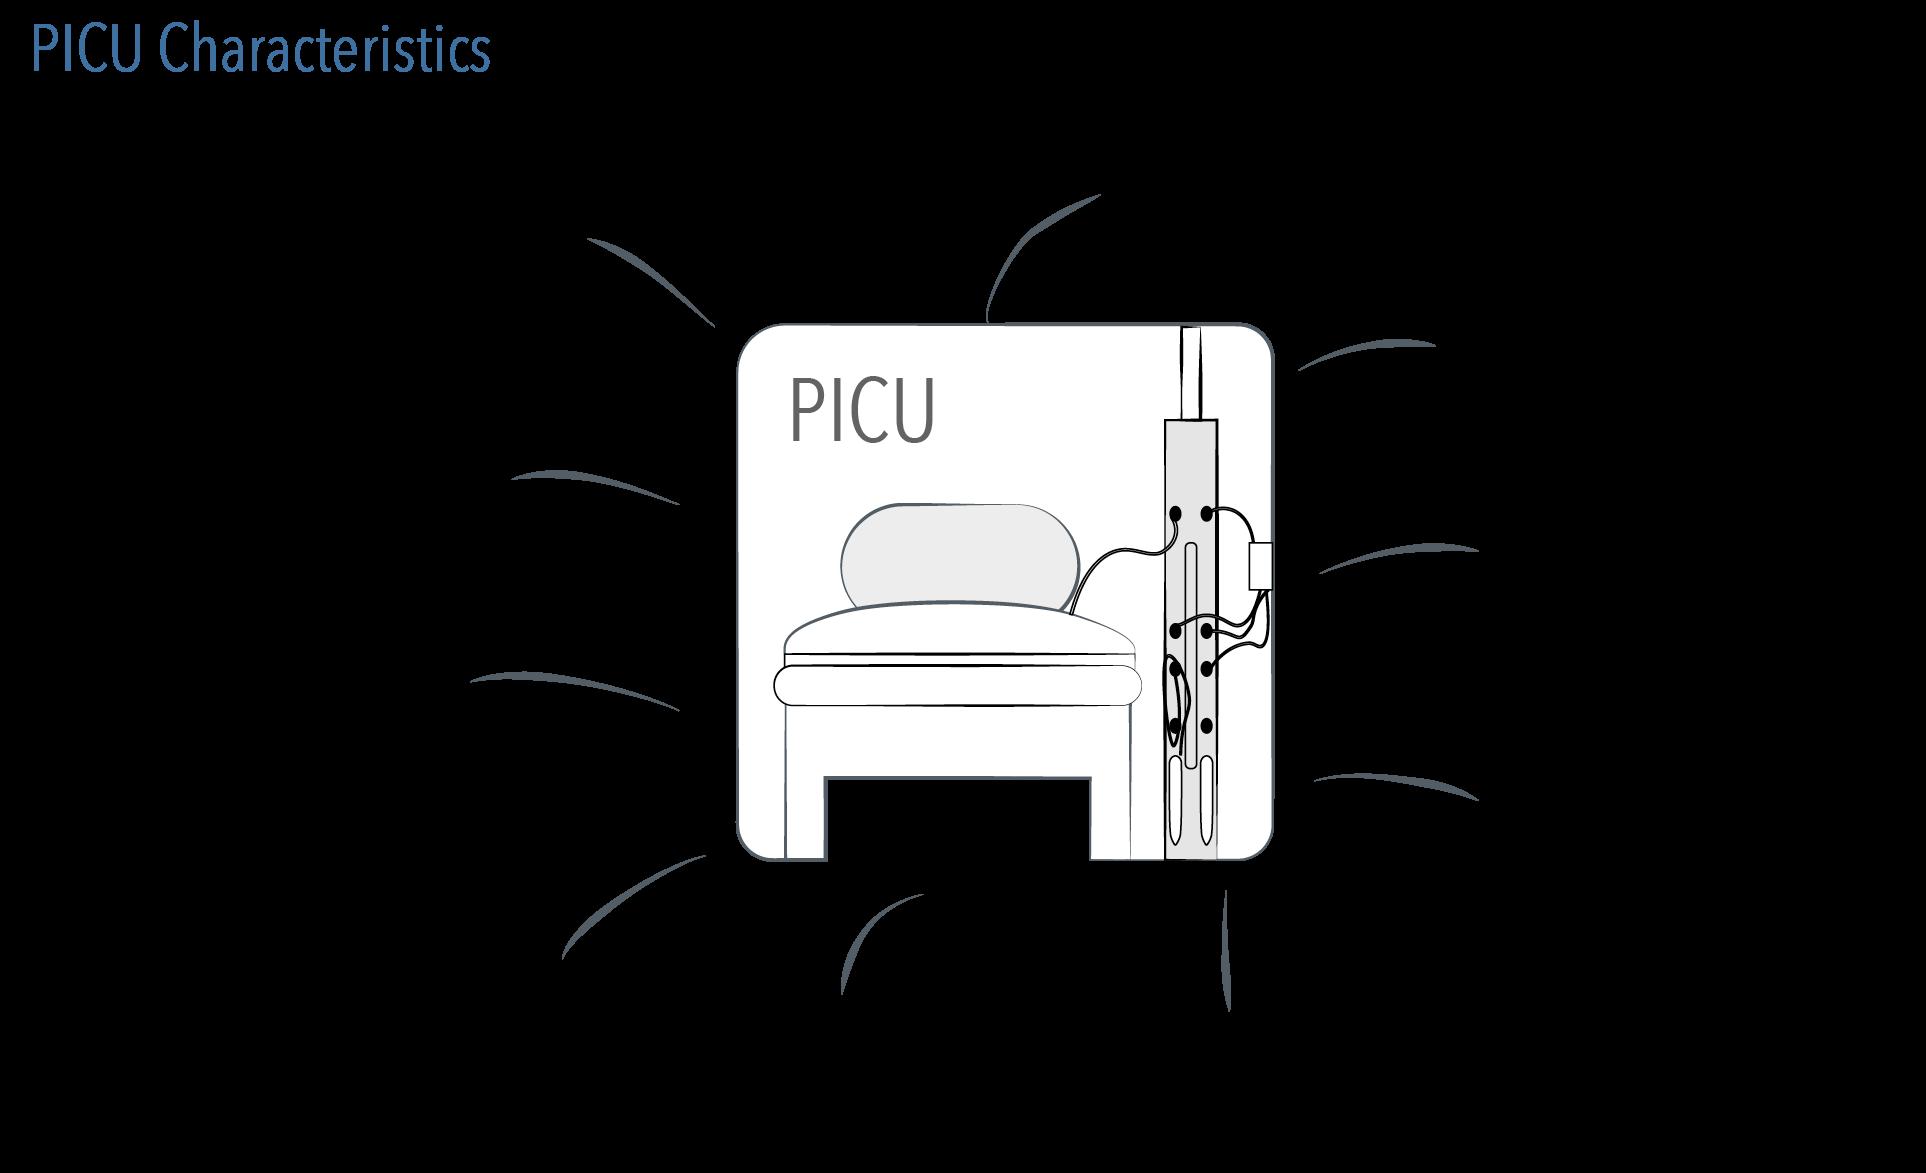 PICU characteristics